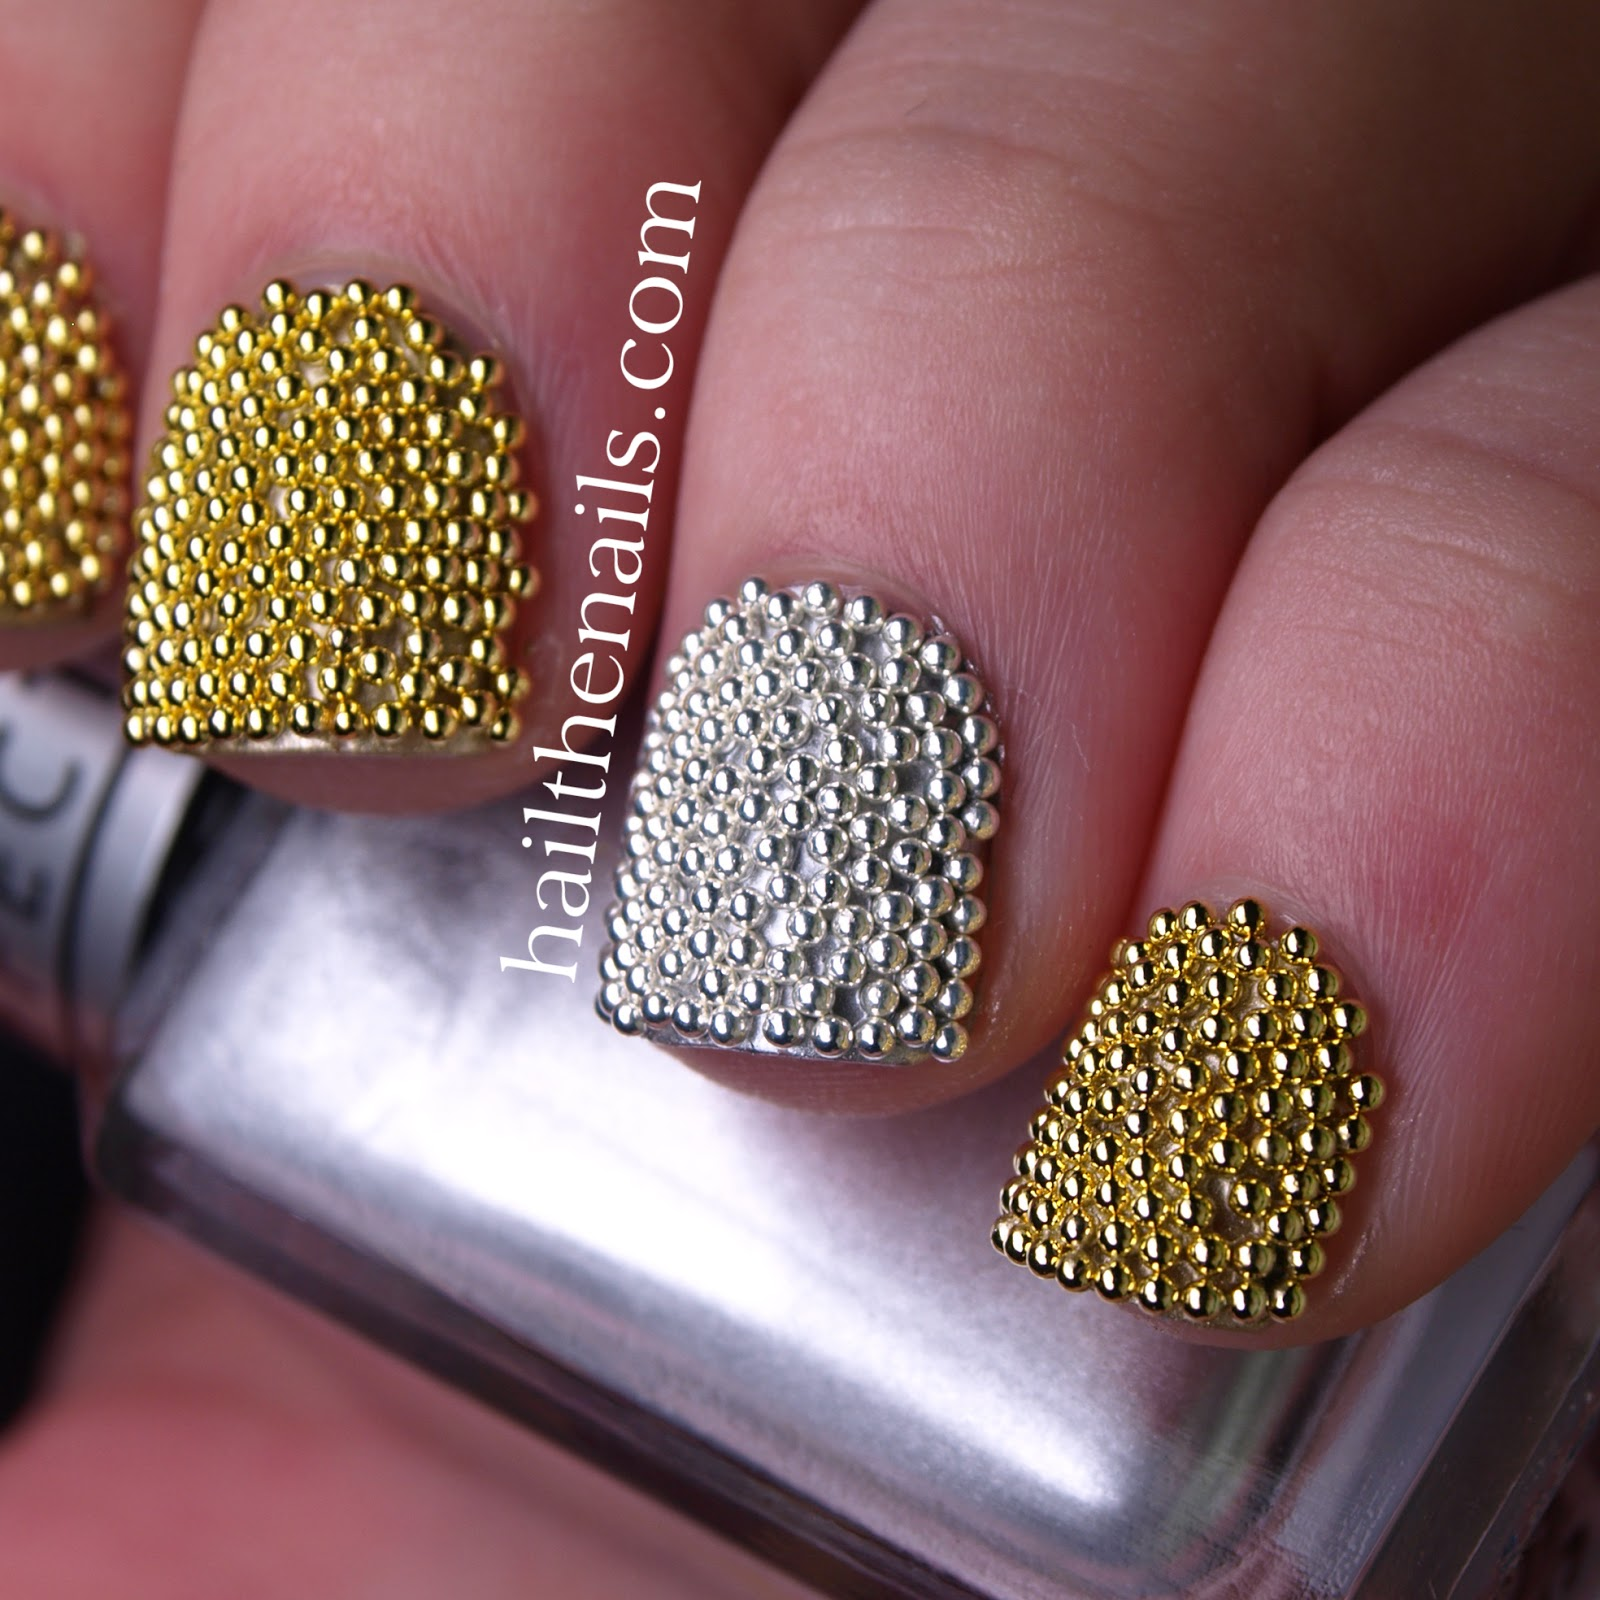 Cost-Effective Caviar Nails! - Beauty Geek UK